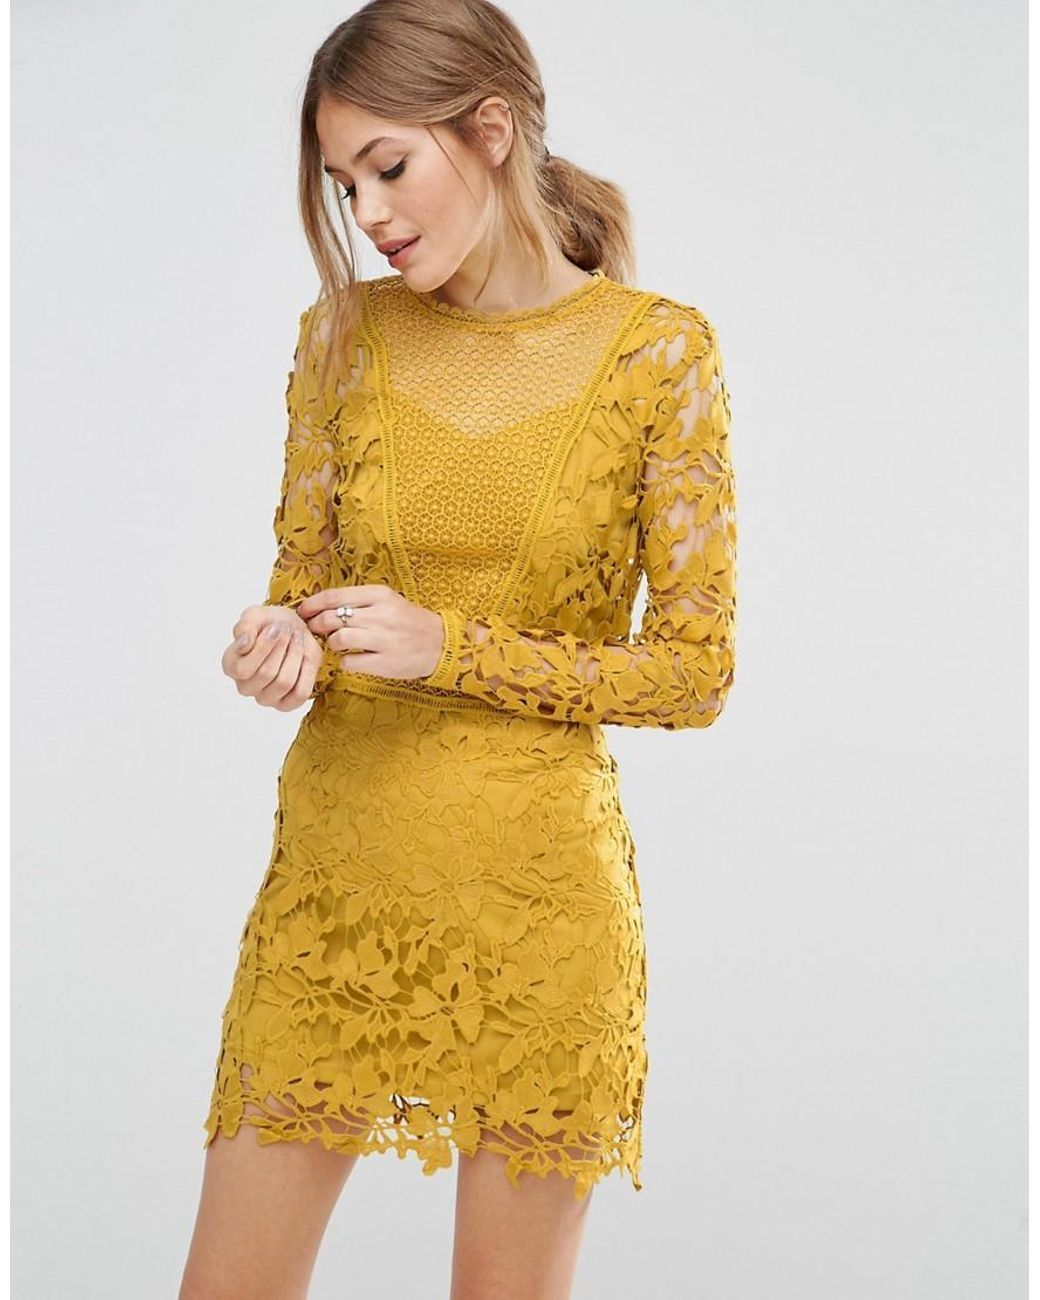 cdc97f4d Women's Yellow Mustard Lace Long Sleeve Paneled Shift Dress in 2019 ...